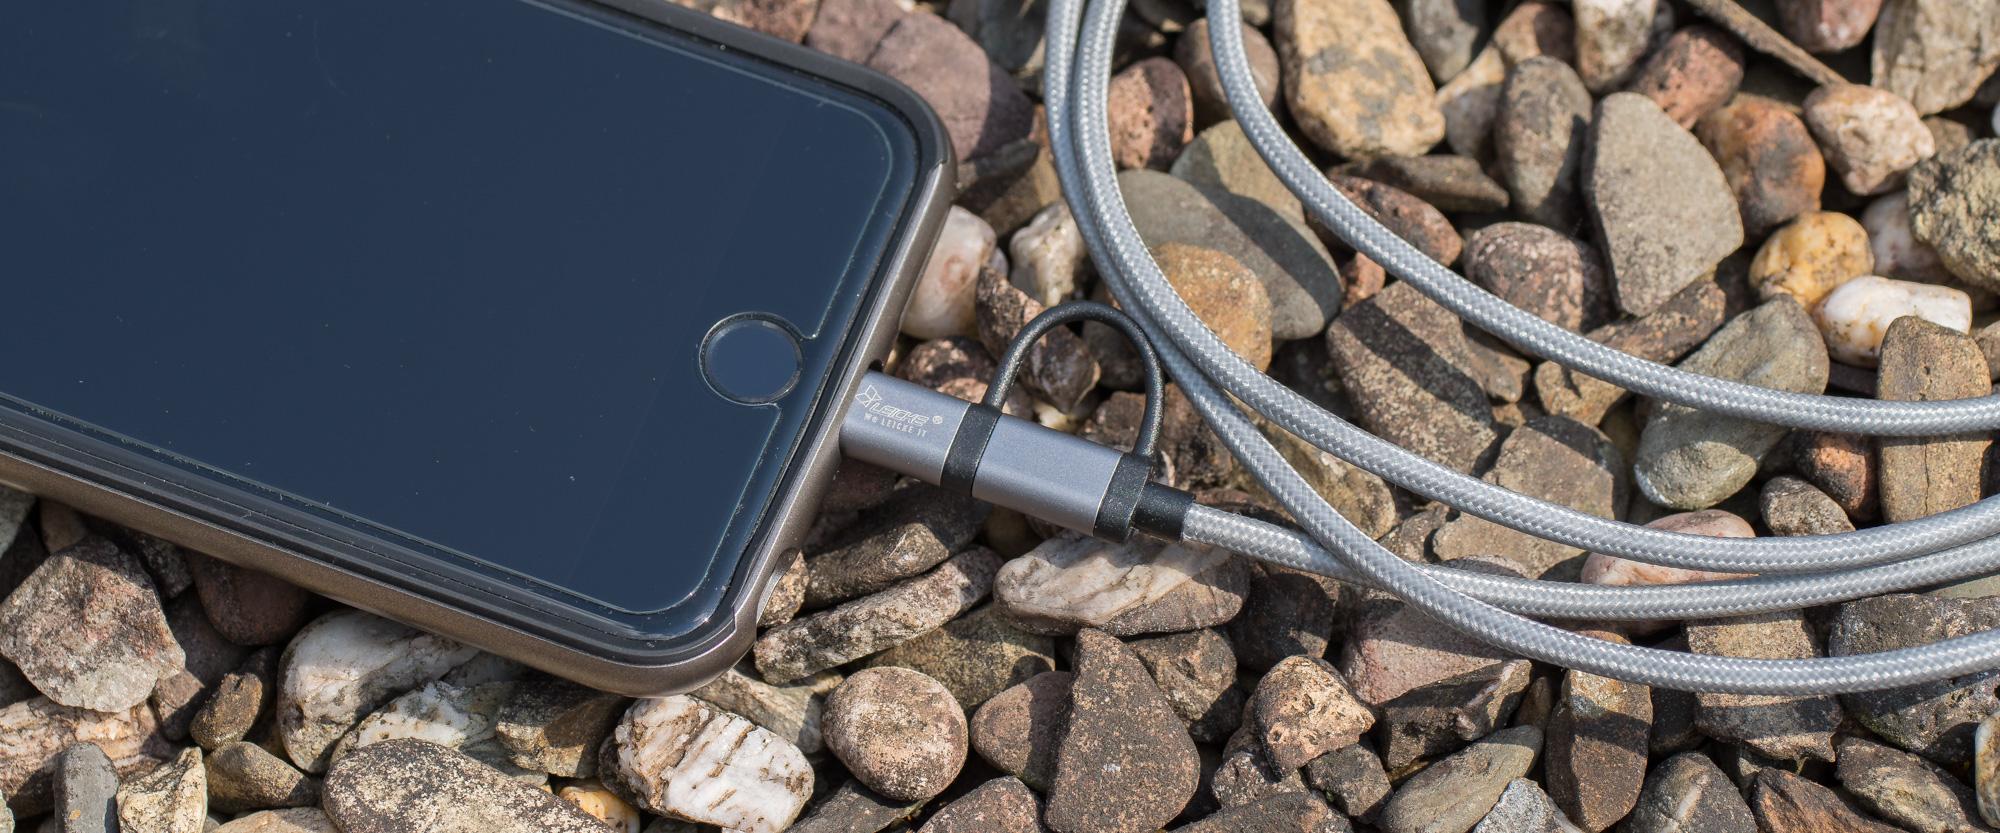 KanaaN Apple Lightning MFi USB Kabel | 2 in 1 mit Lightning und MicroUSB | MFi Zertifiziert | 1.8m